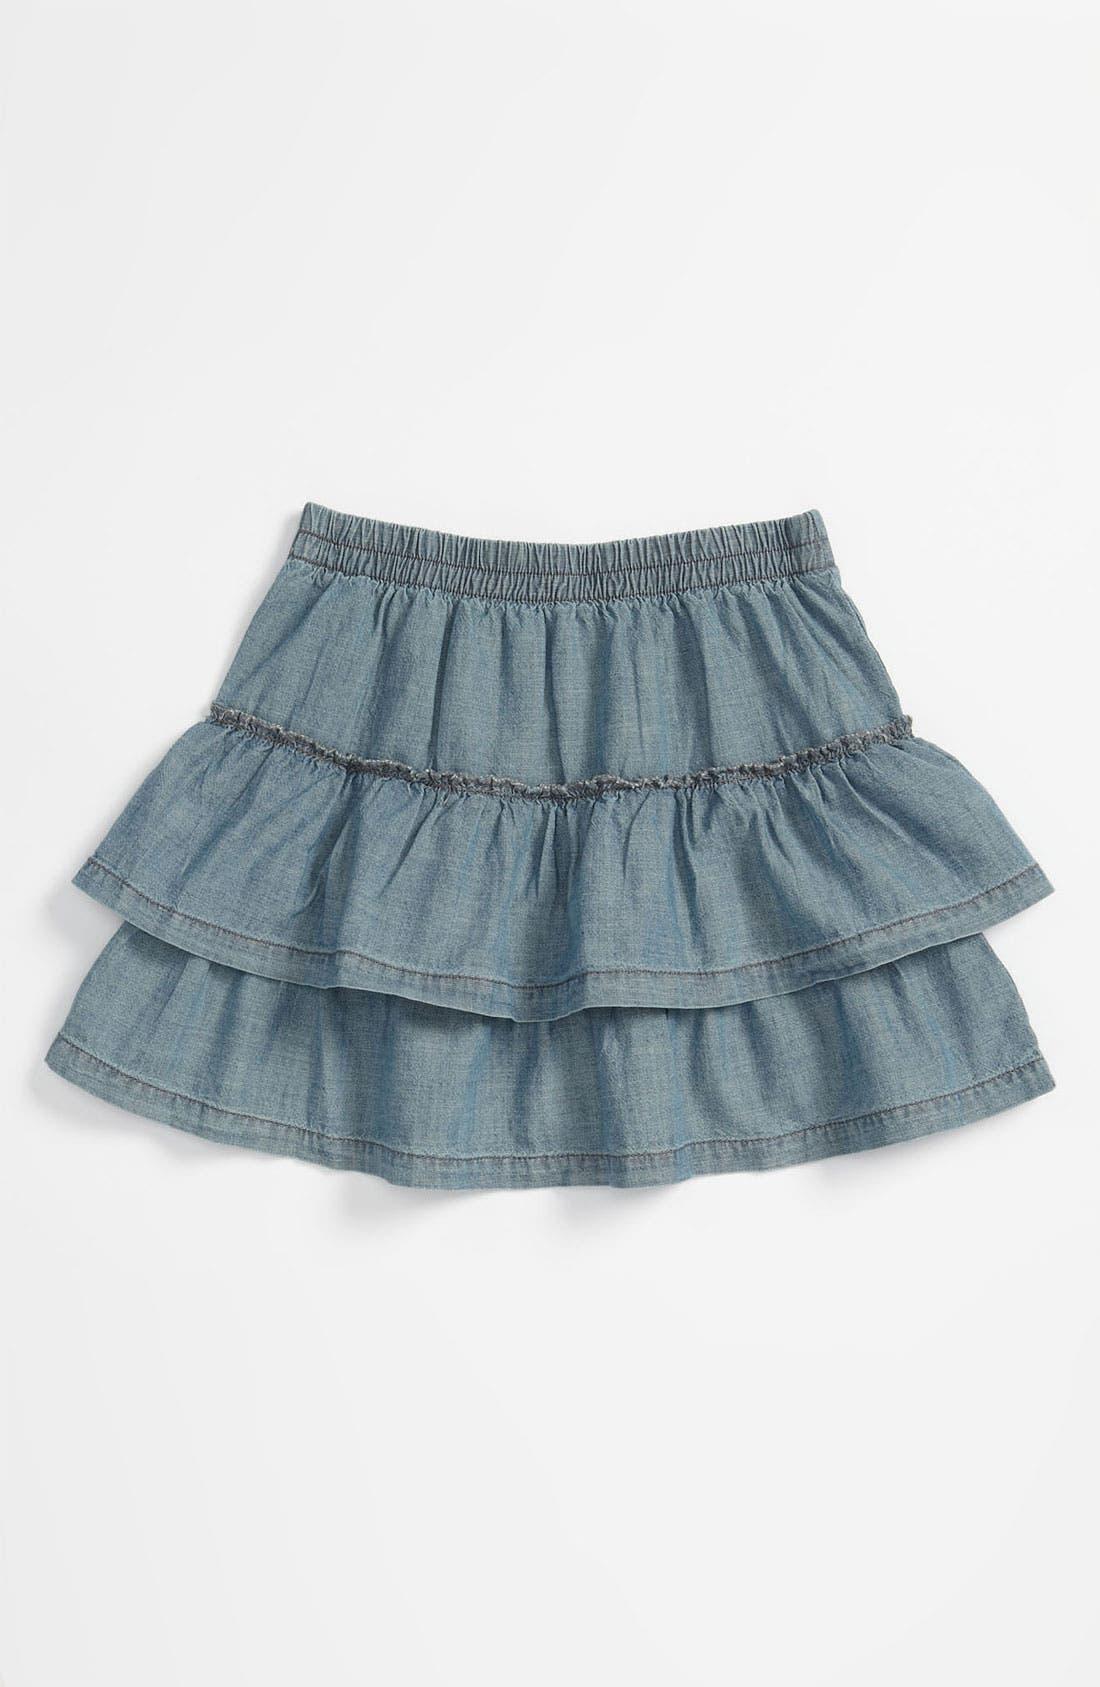 Main Image - Peek 'Darcy' Skirt (Toddler, Little Girls & Big Girls)